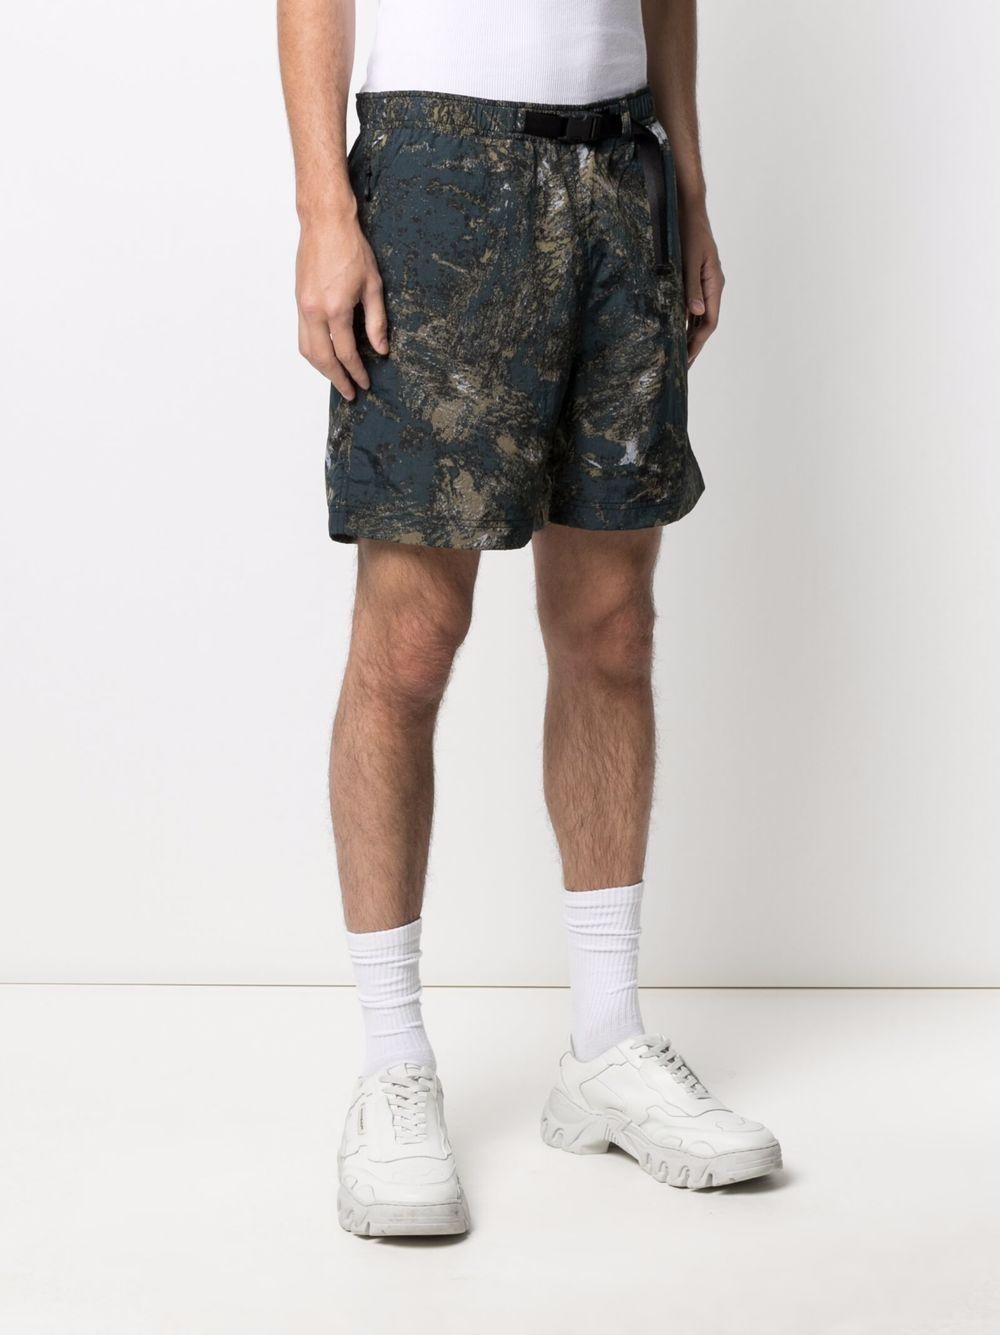 Carhartt Wip terra shorts man black CARHARTT WIP | Shorts | I0287550BU.90